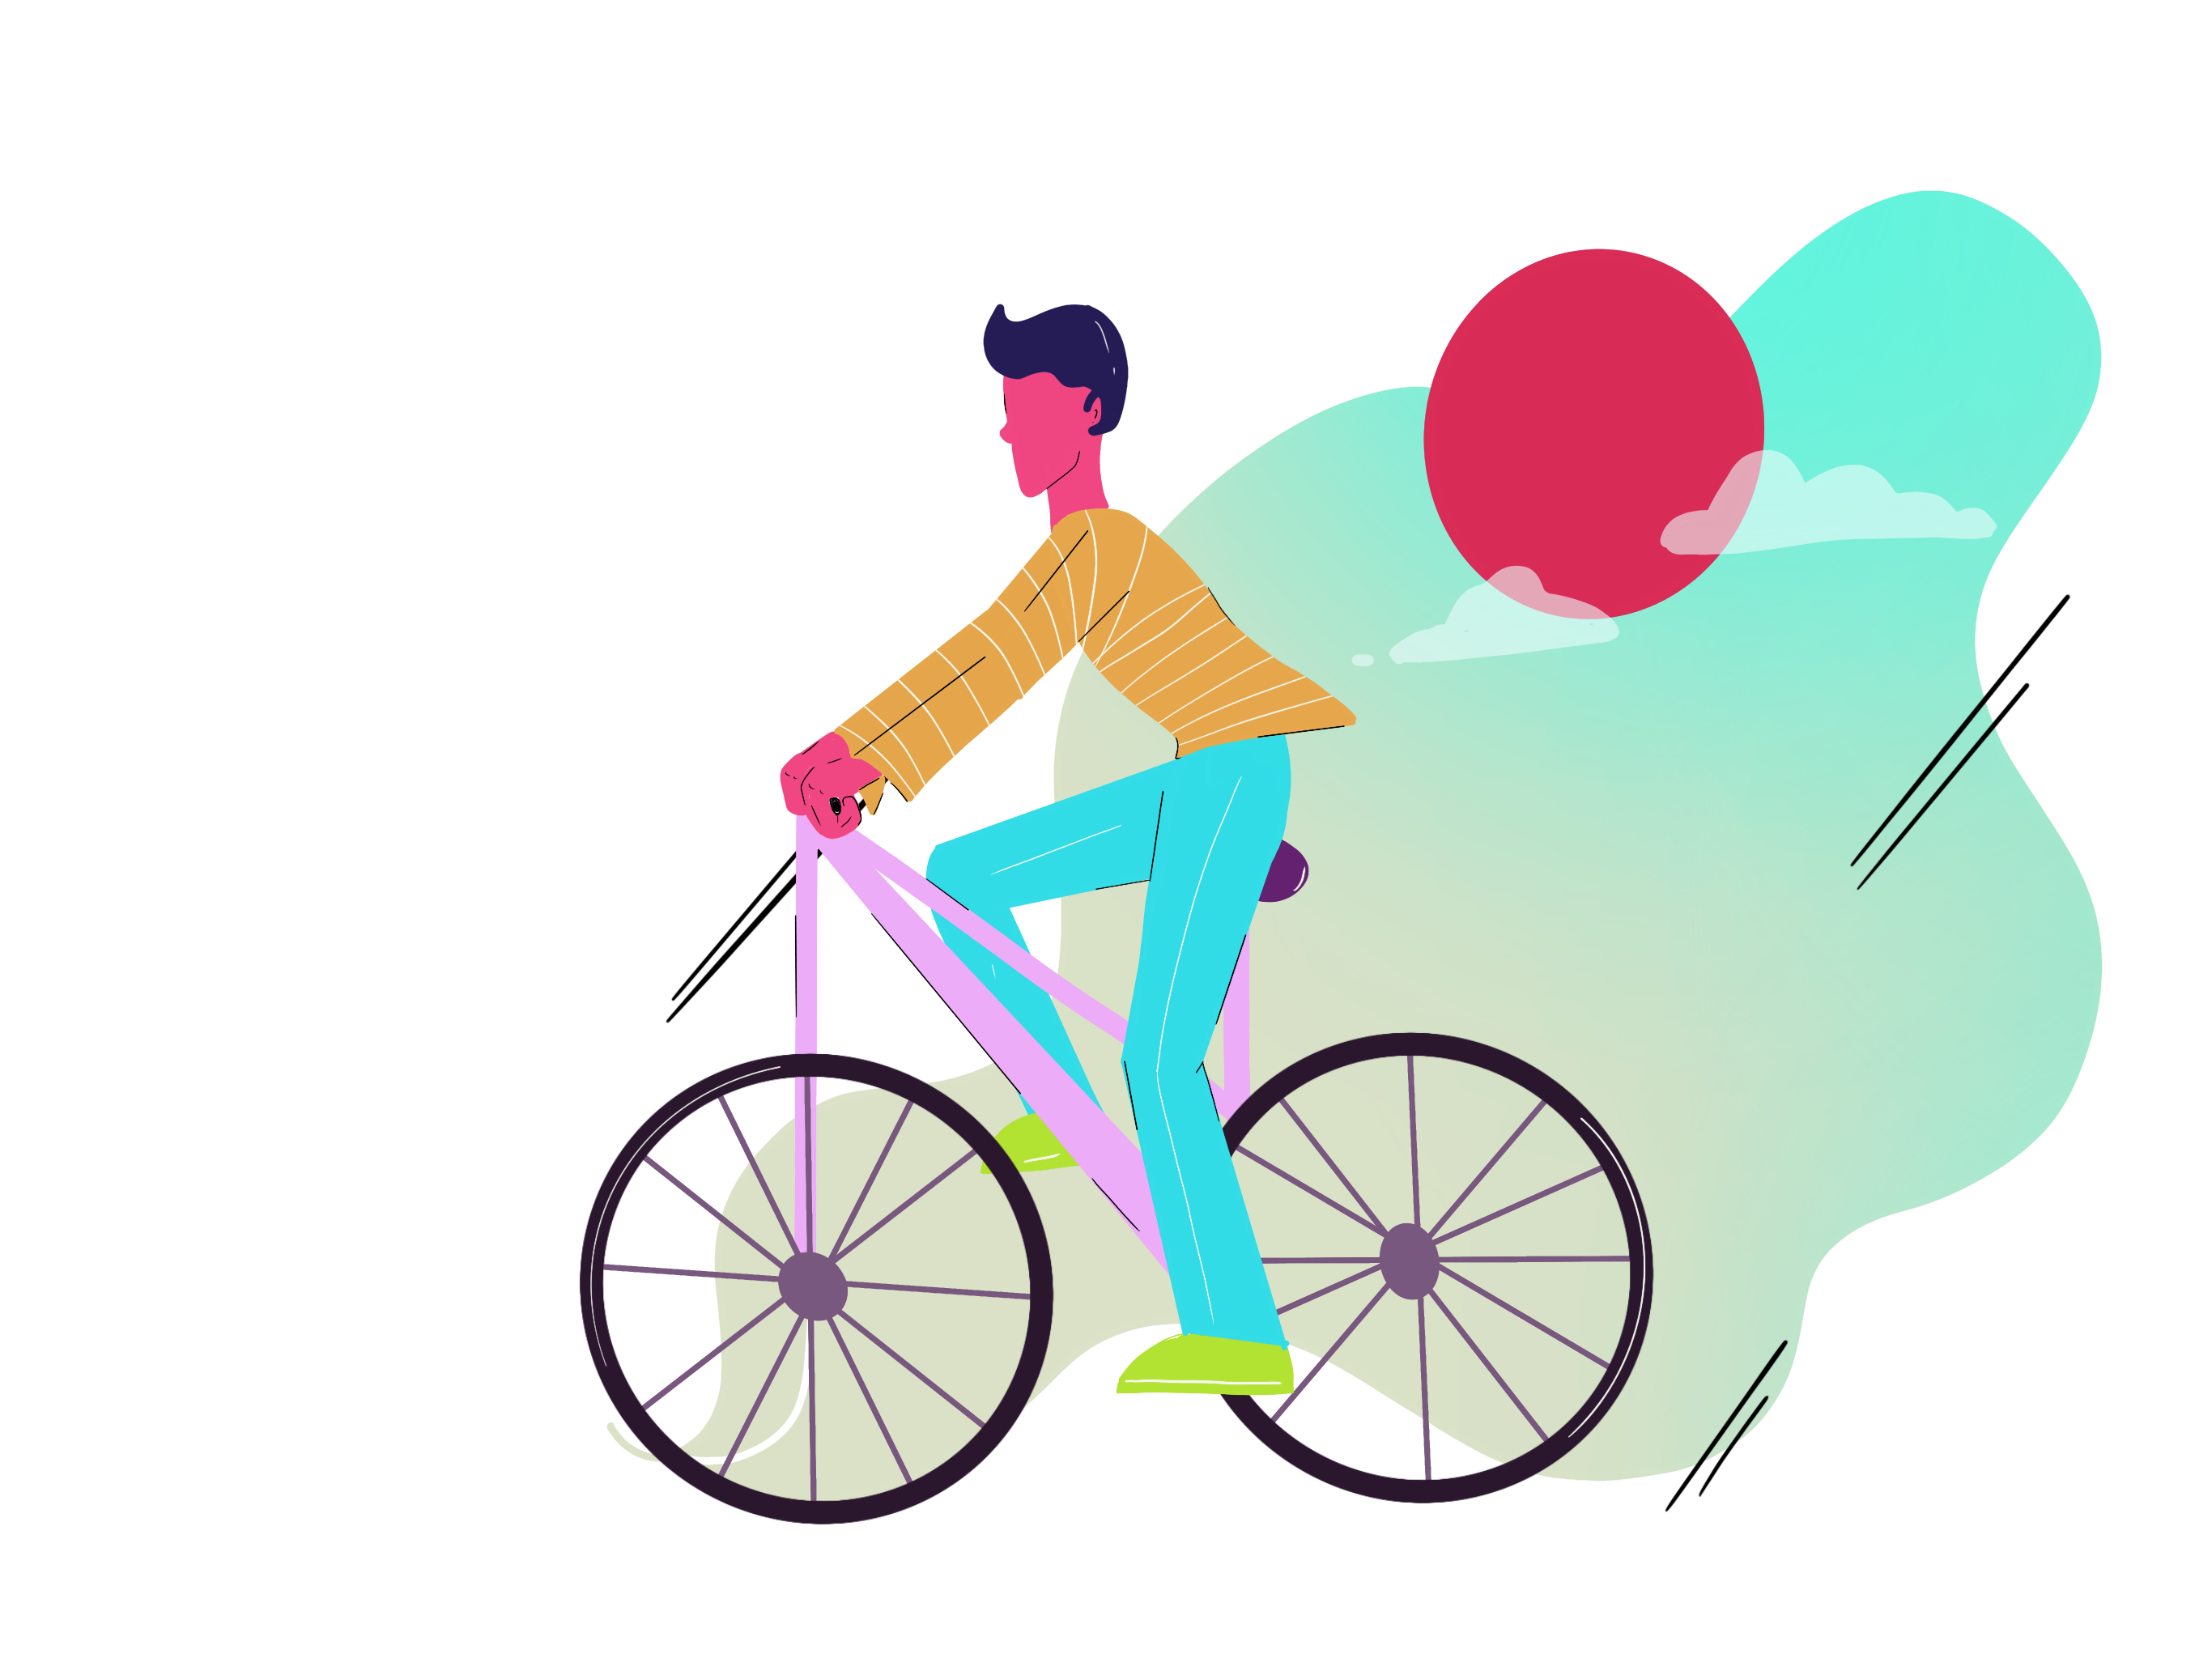 An illustration of a man riding a bike.